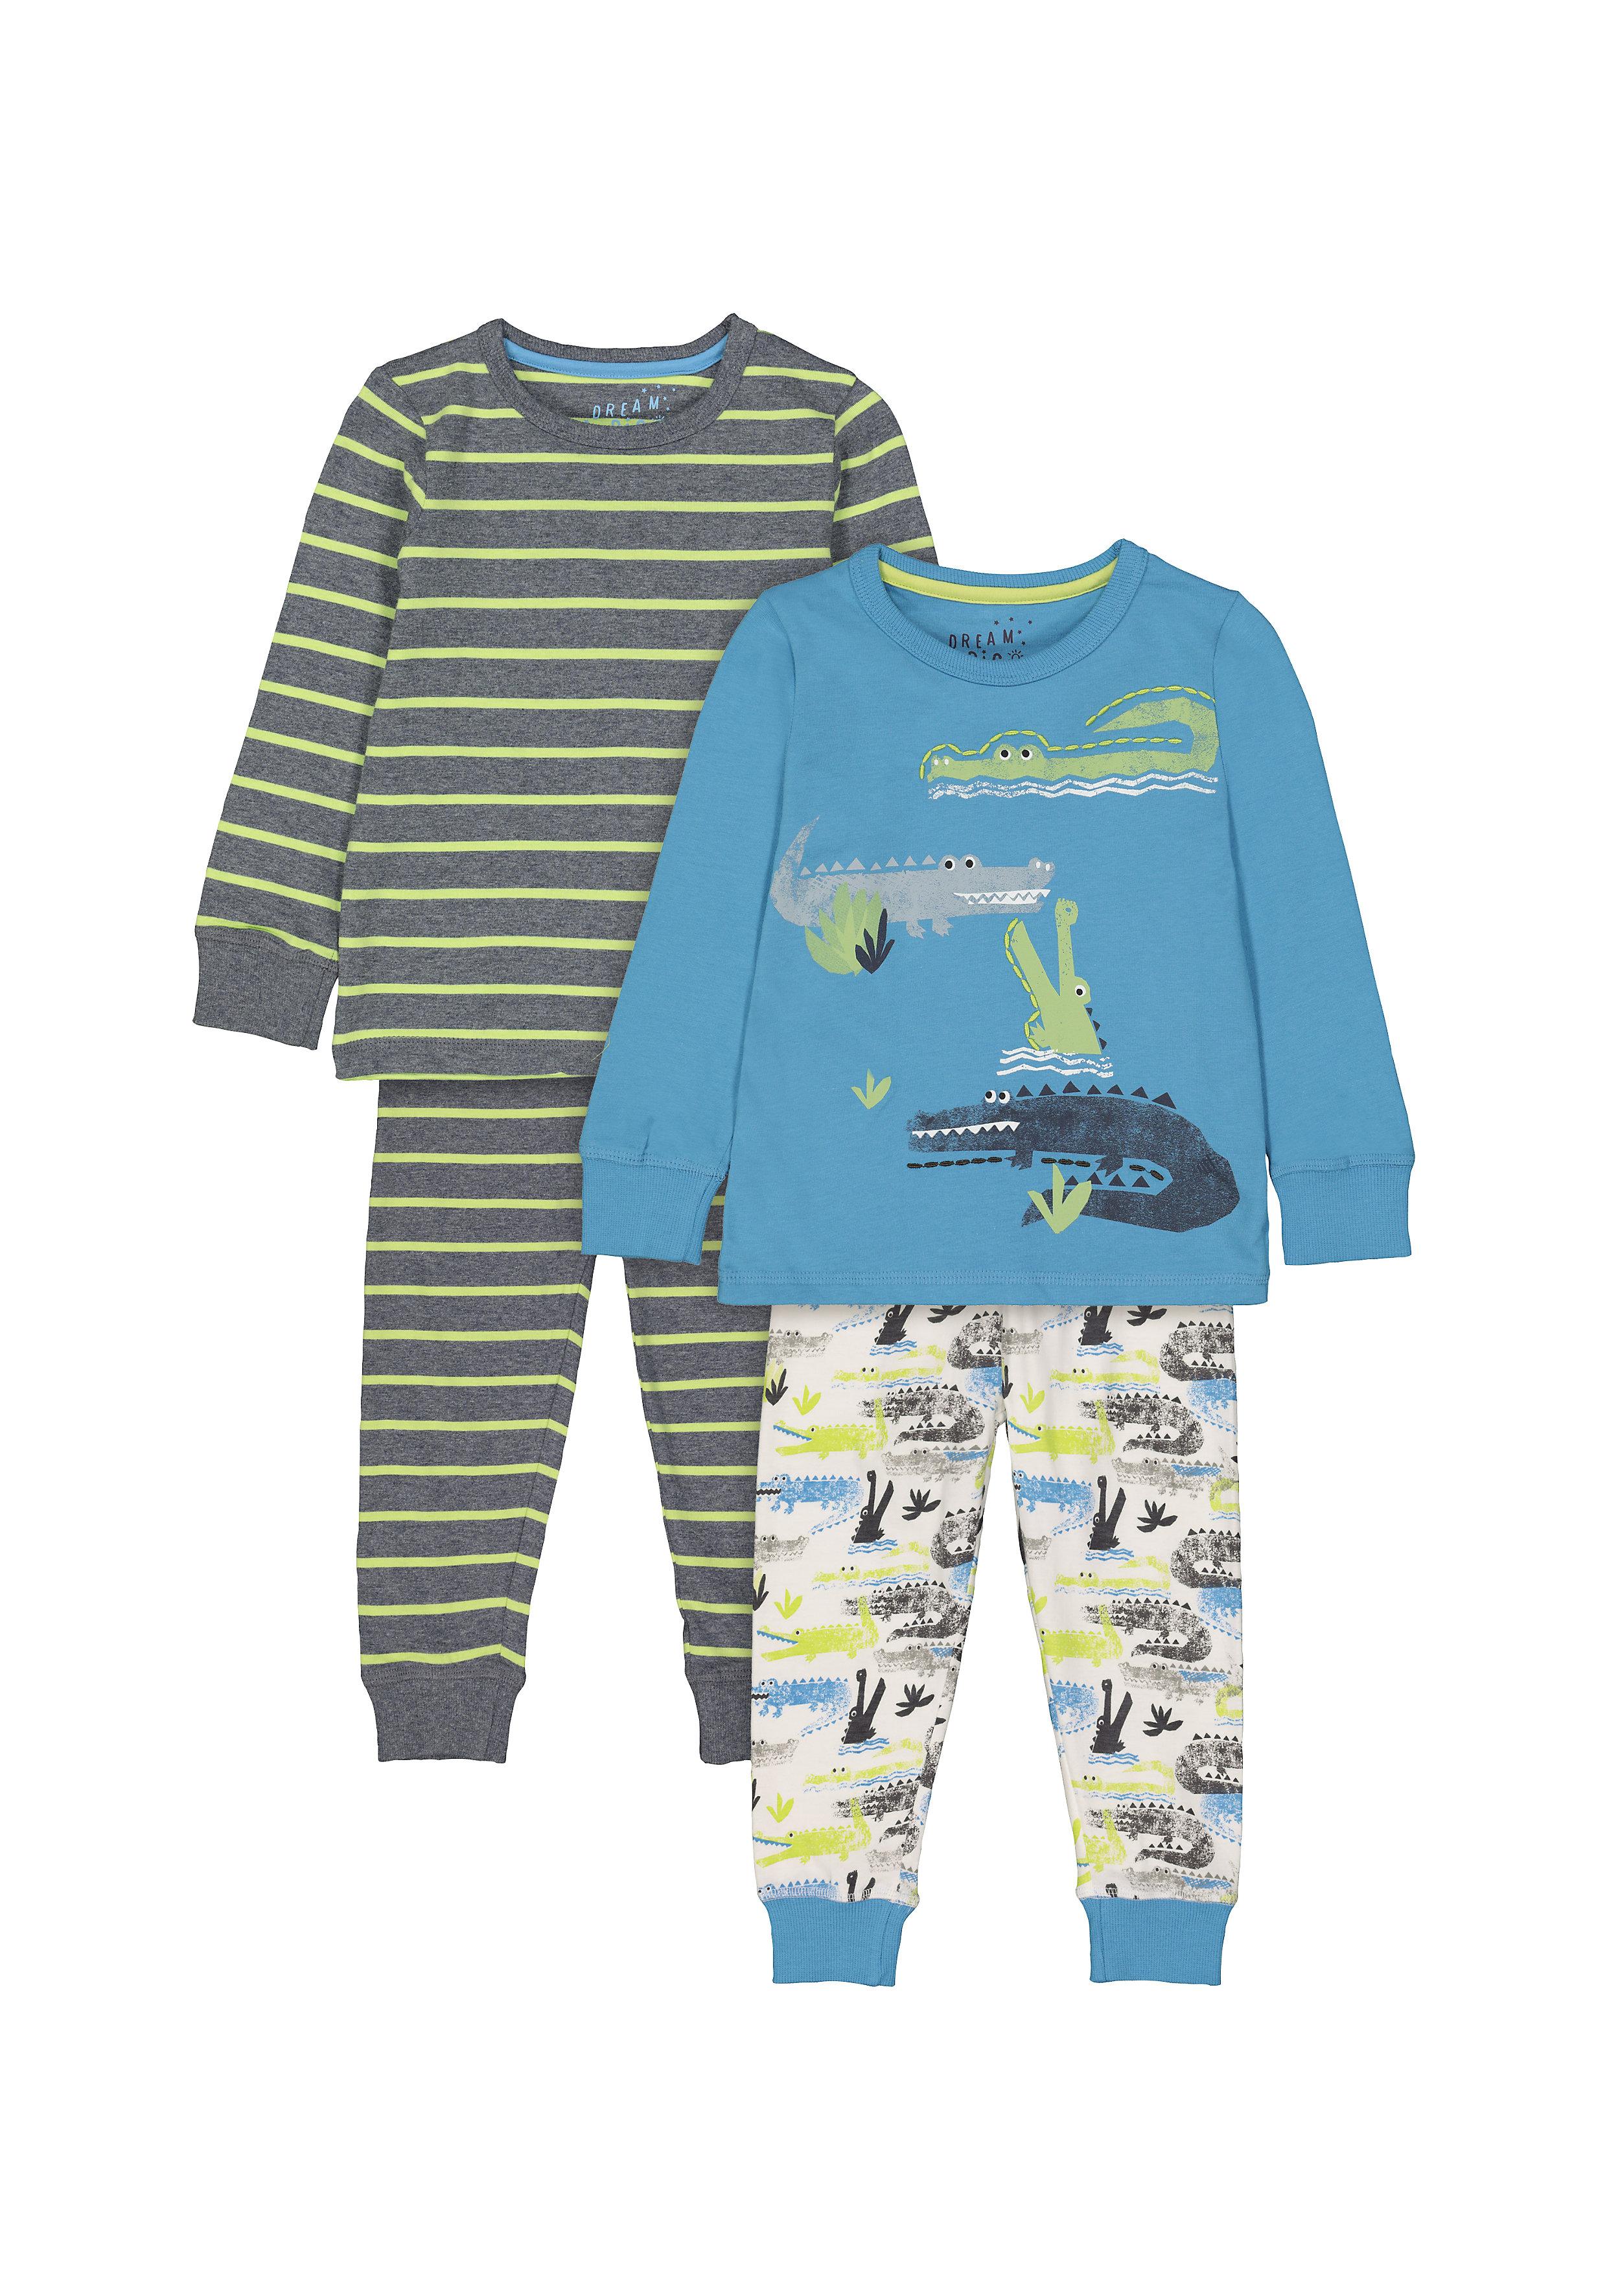 Mothercare | Boys Full sleeves Stripe and crocodile print Pyjamas - Pack of 2 - Multicolor